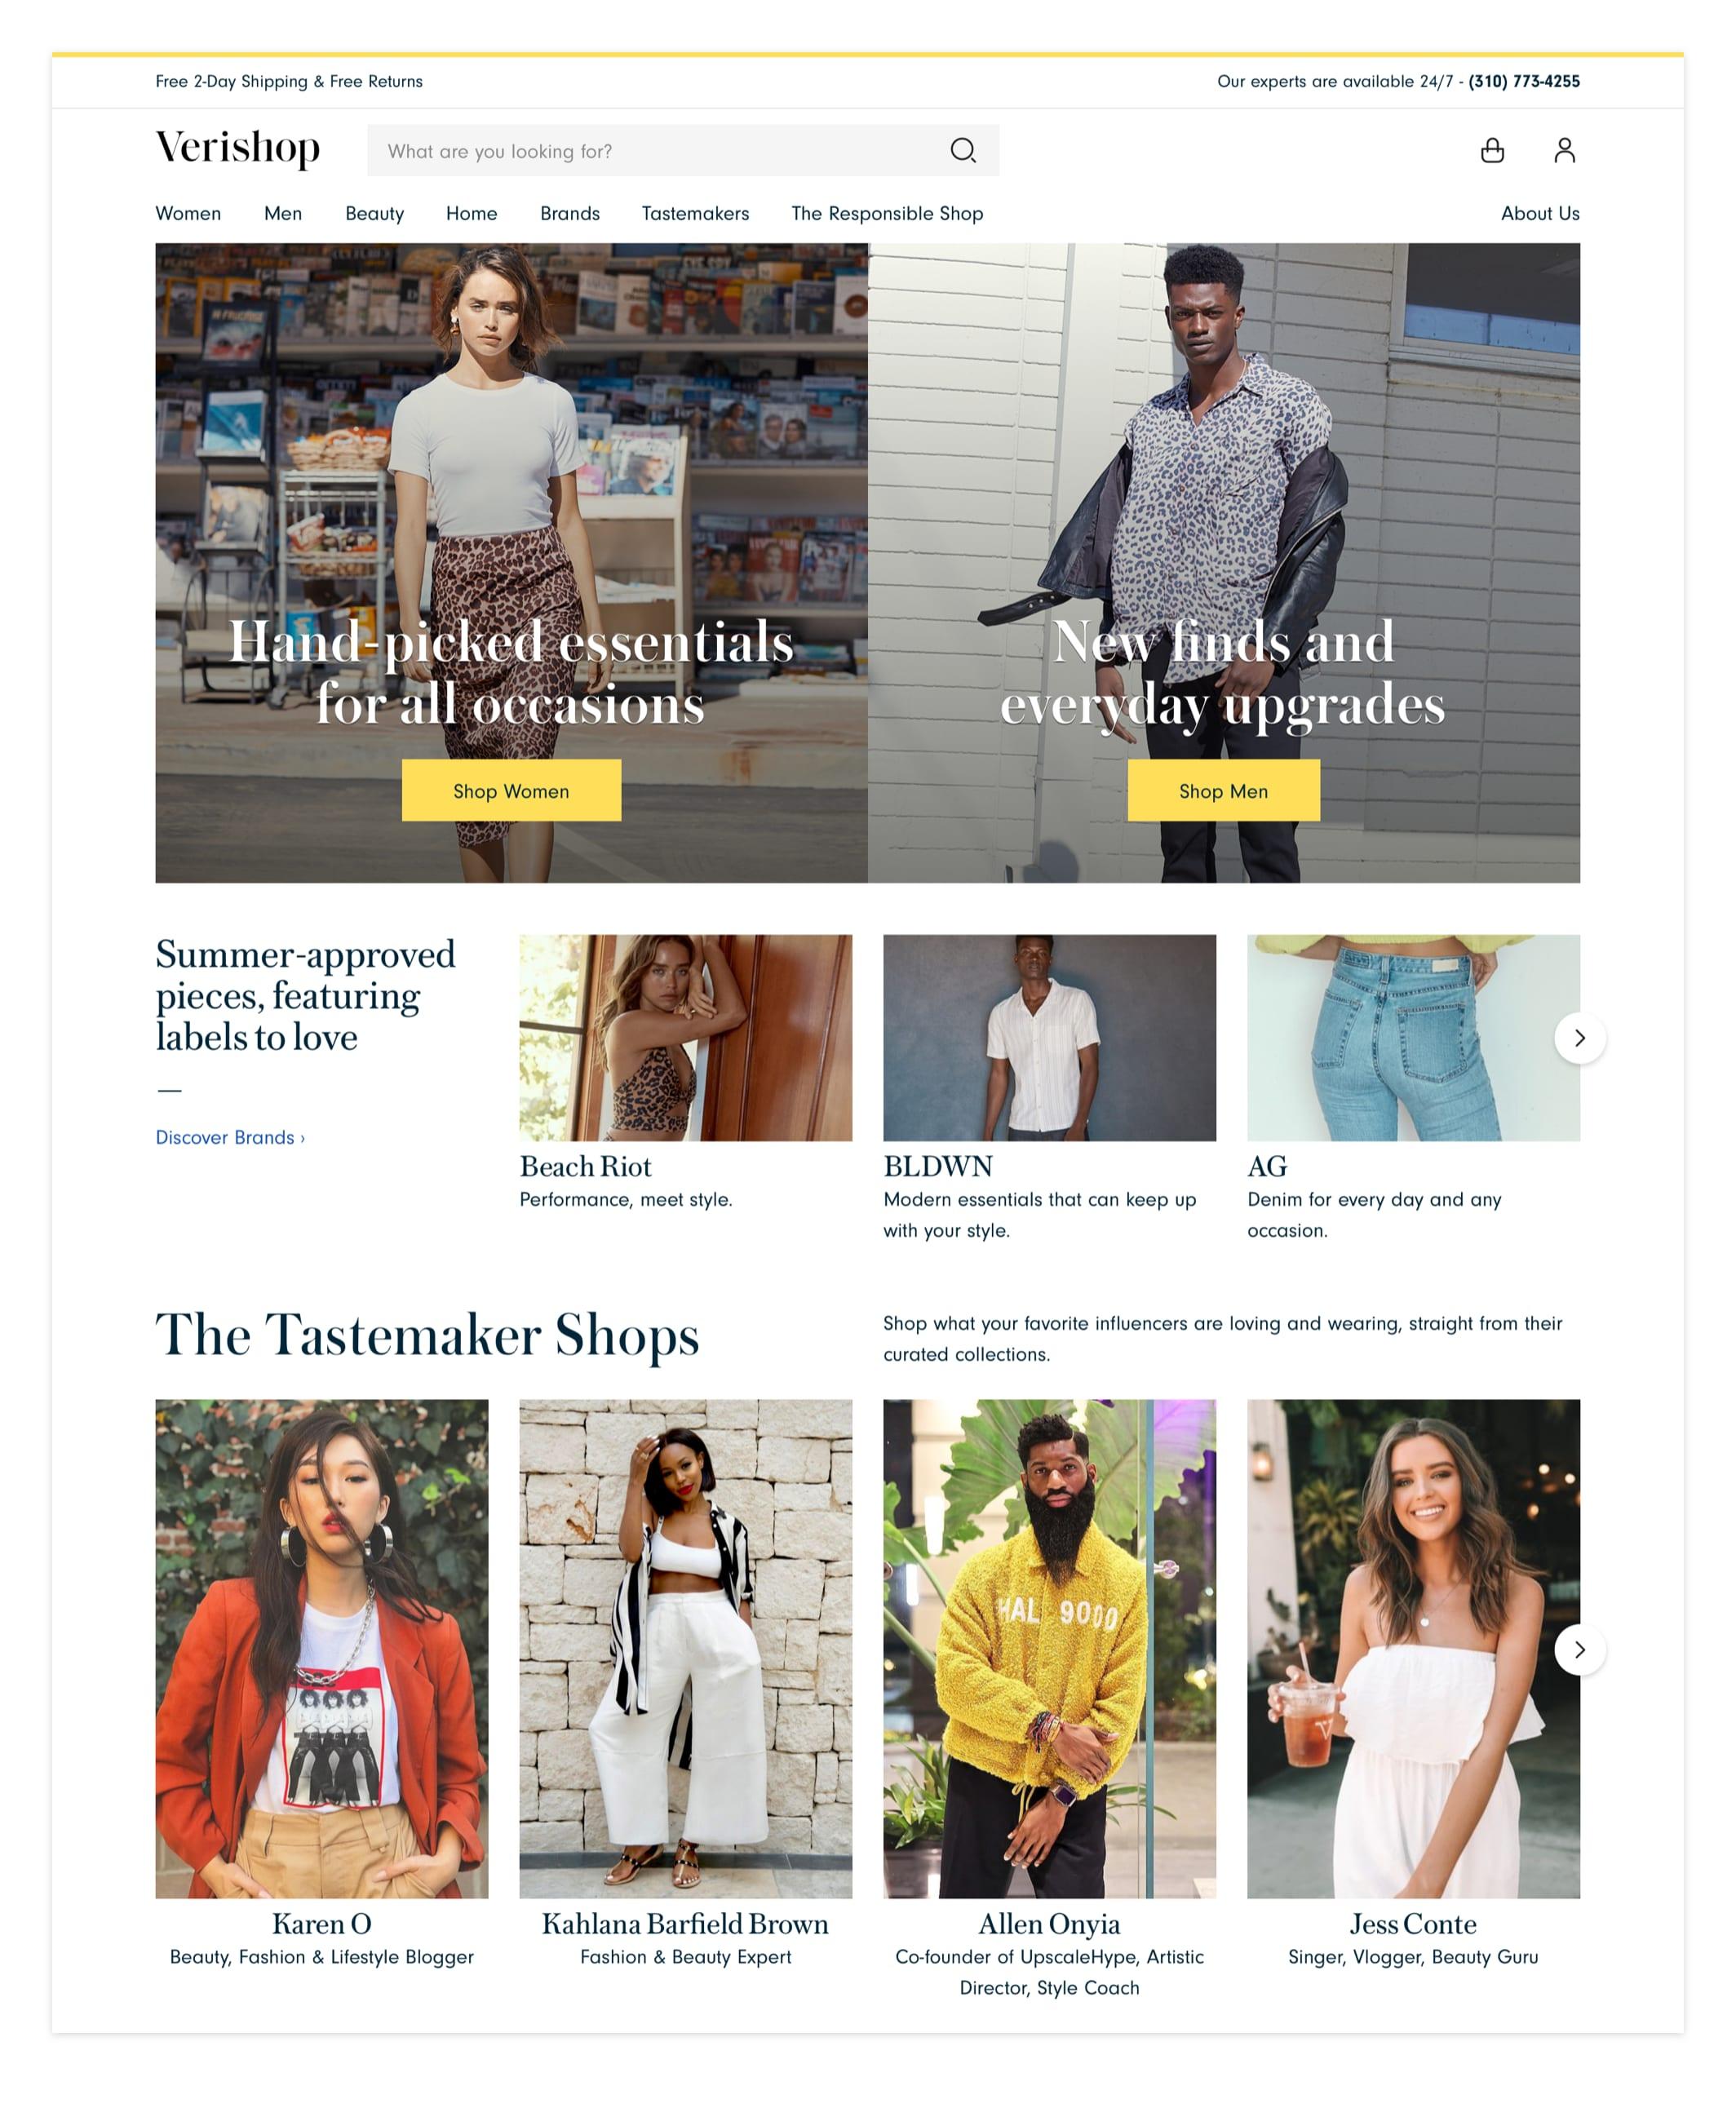 Former Snap exec Imran Khan's new retail website, Verishop, goes live